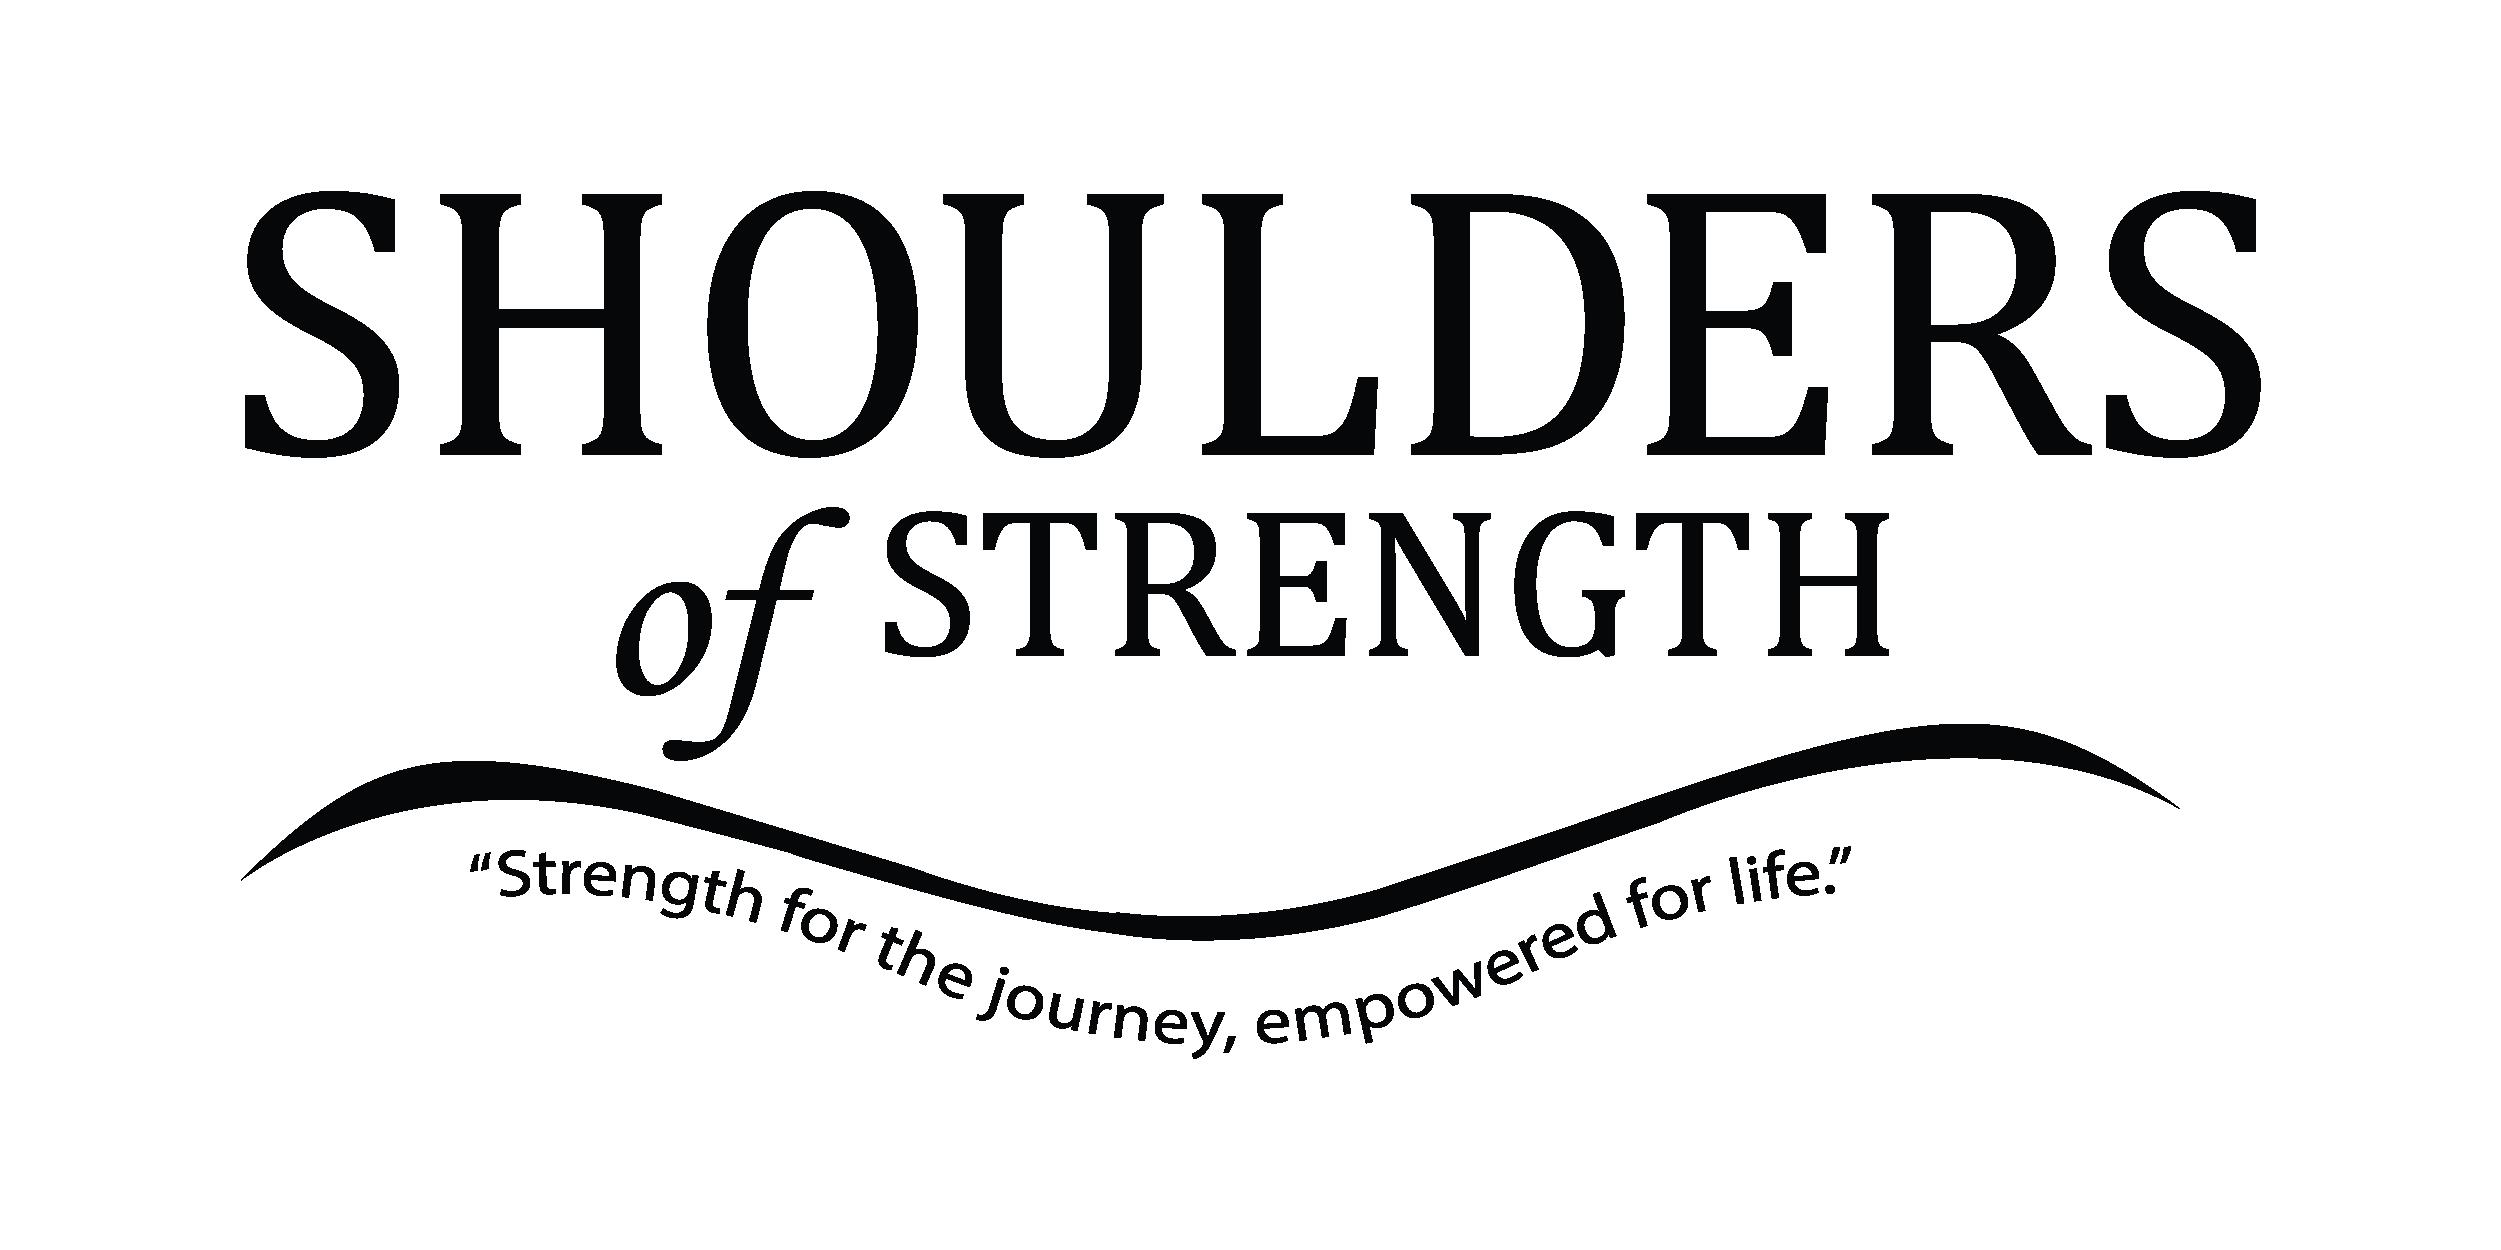 Shoulders of Strength, Inc.